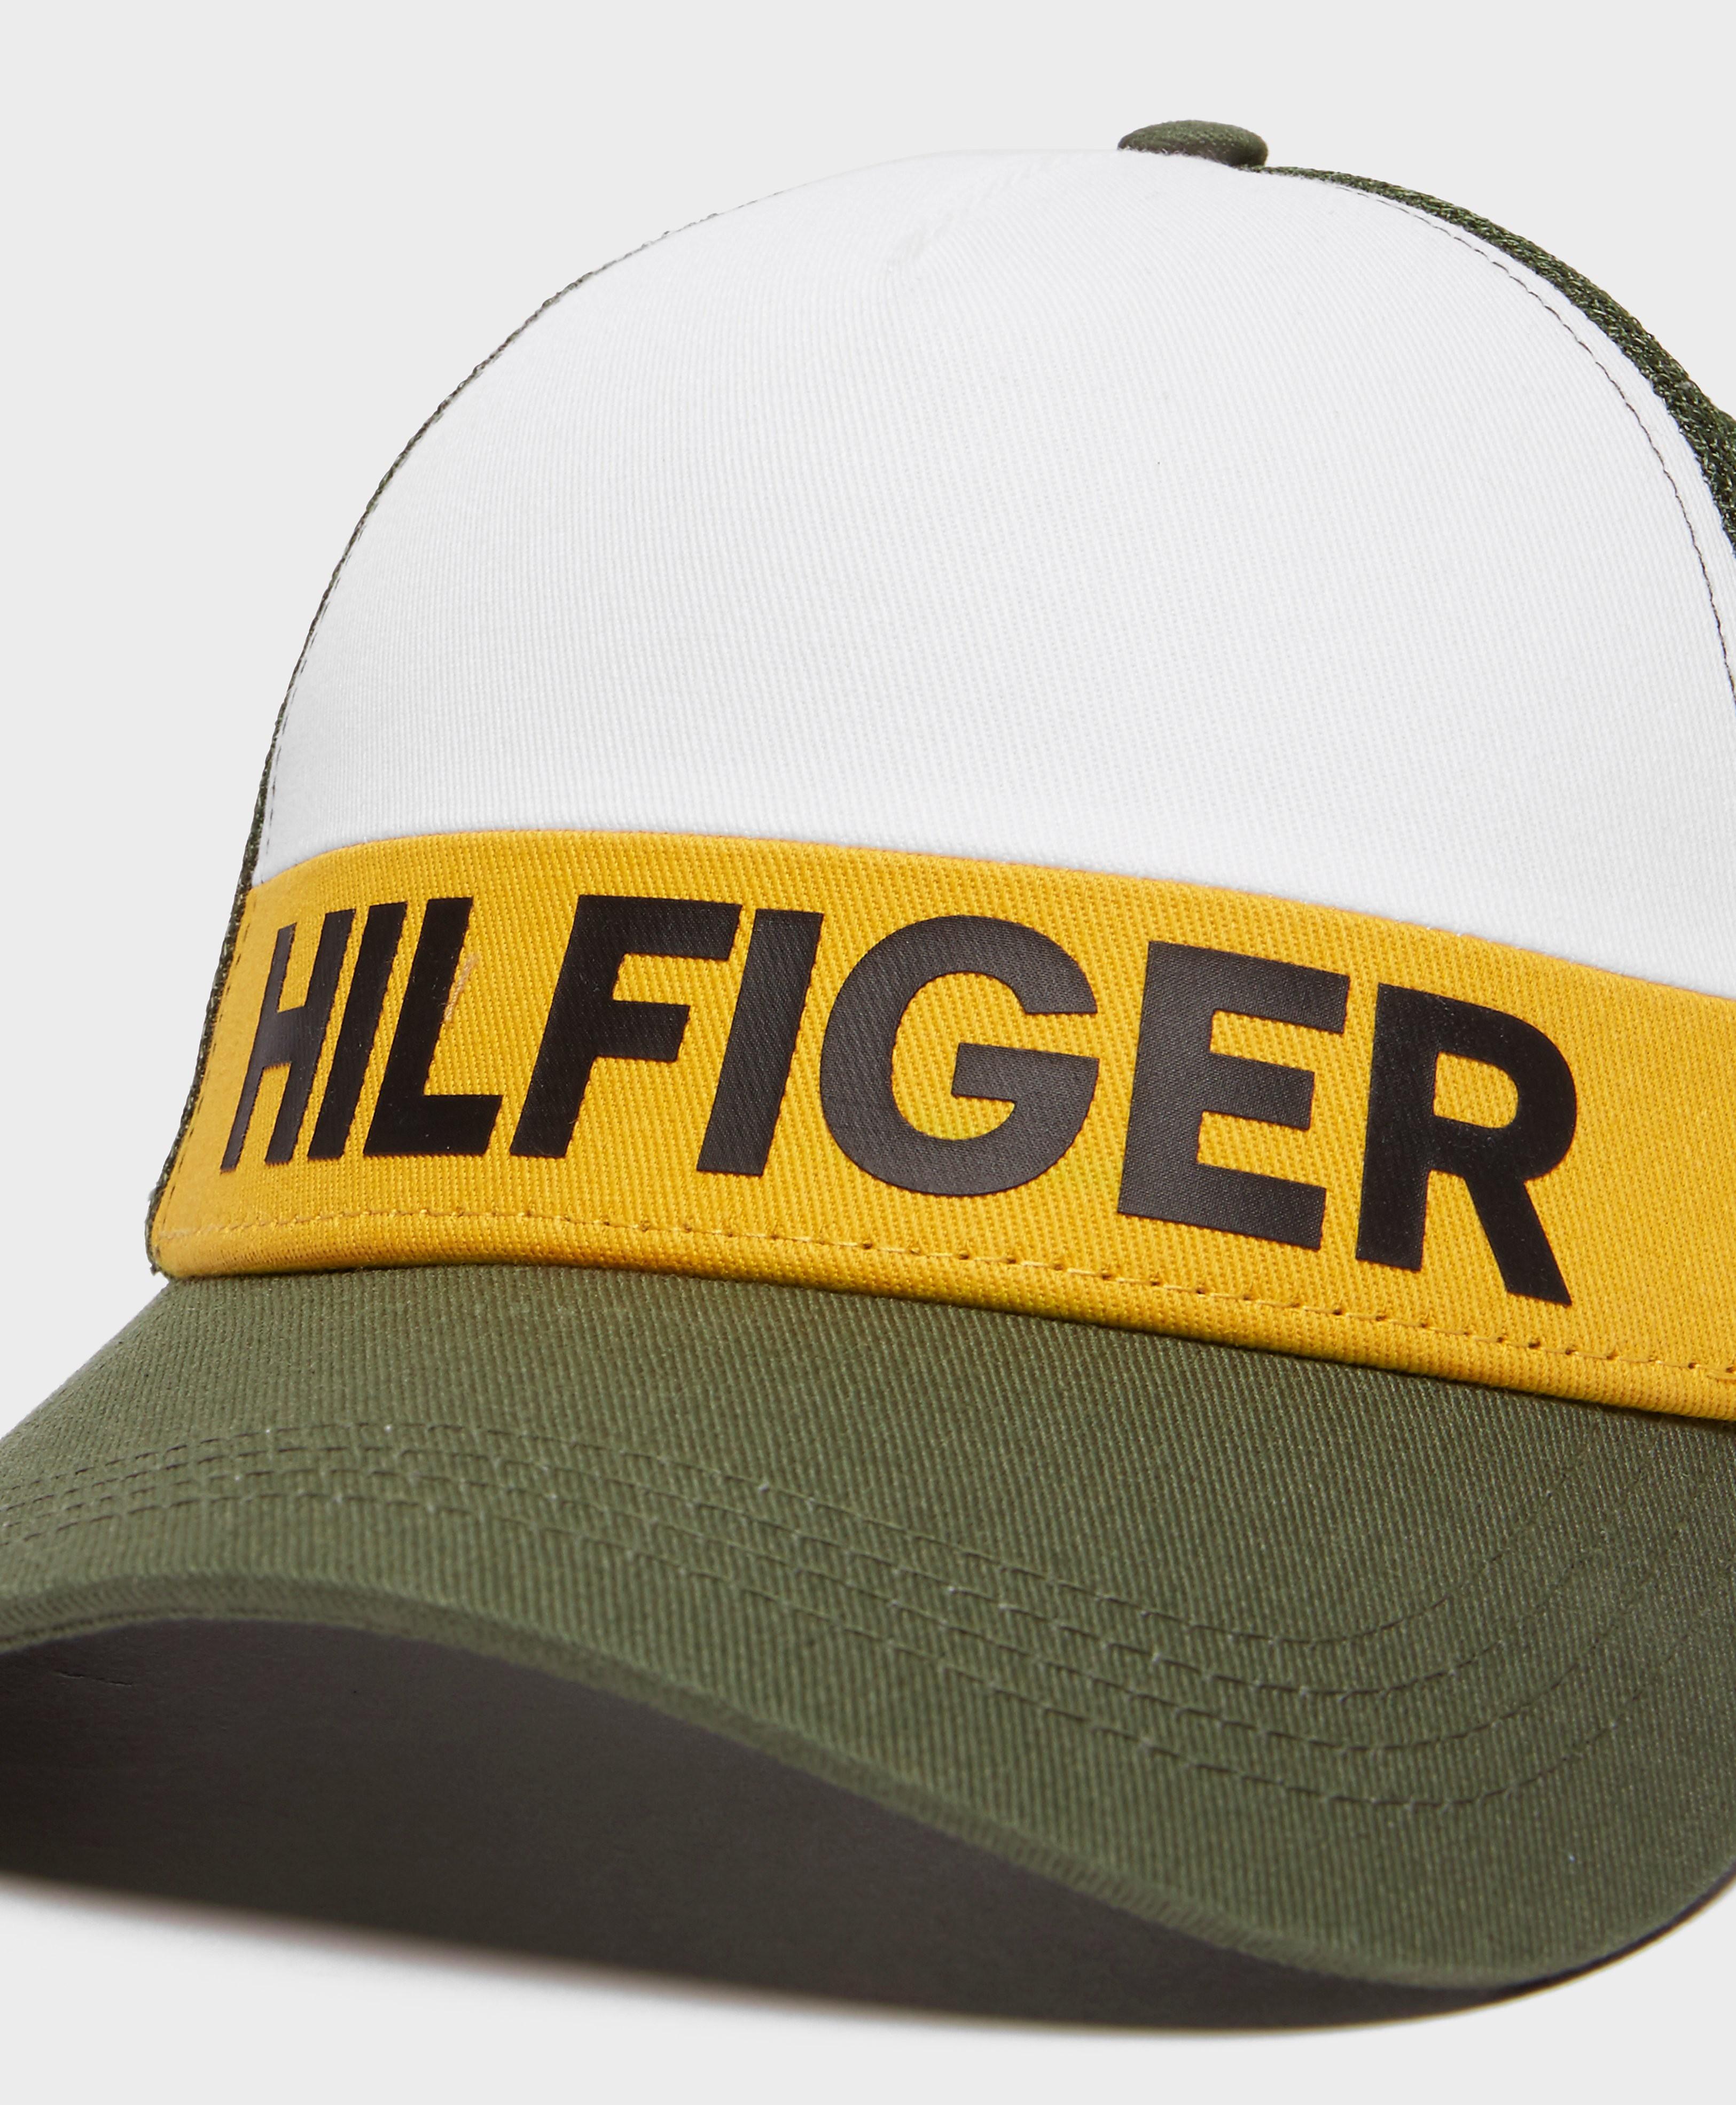 Tommy Hilfiger Trucker Cap